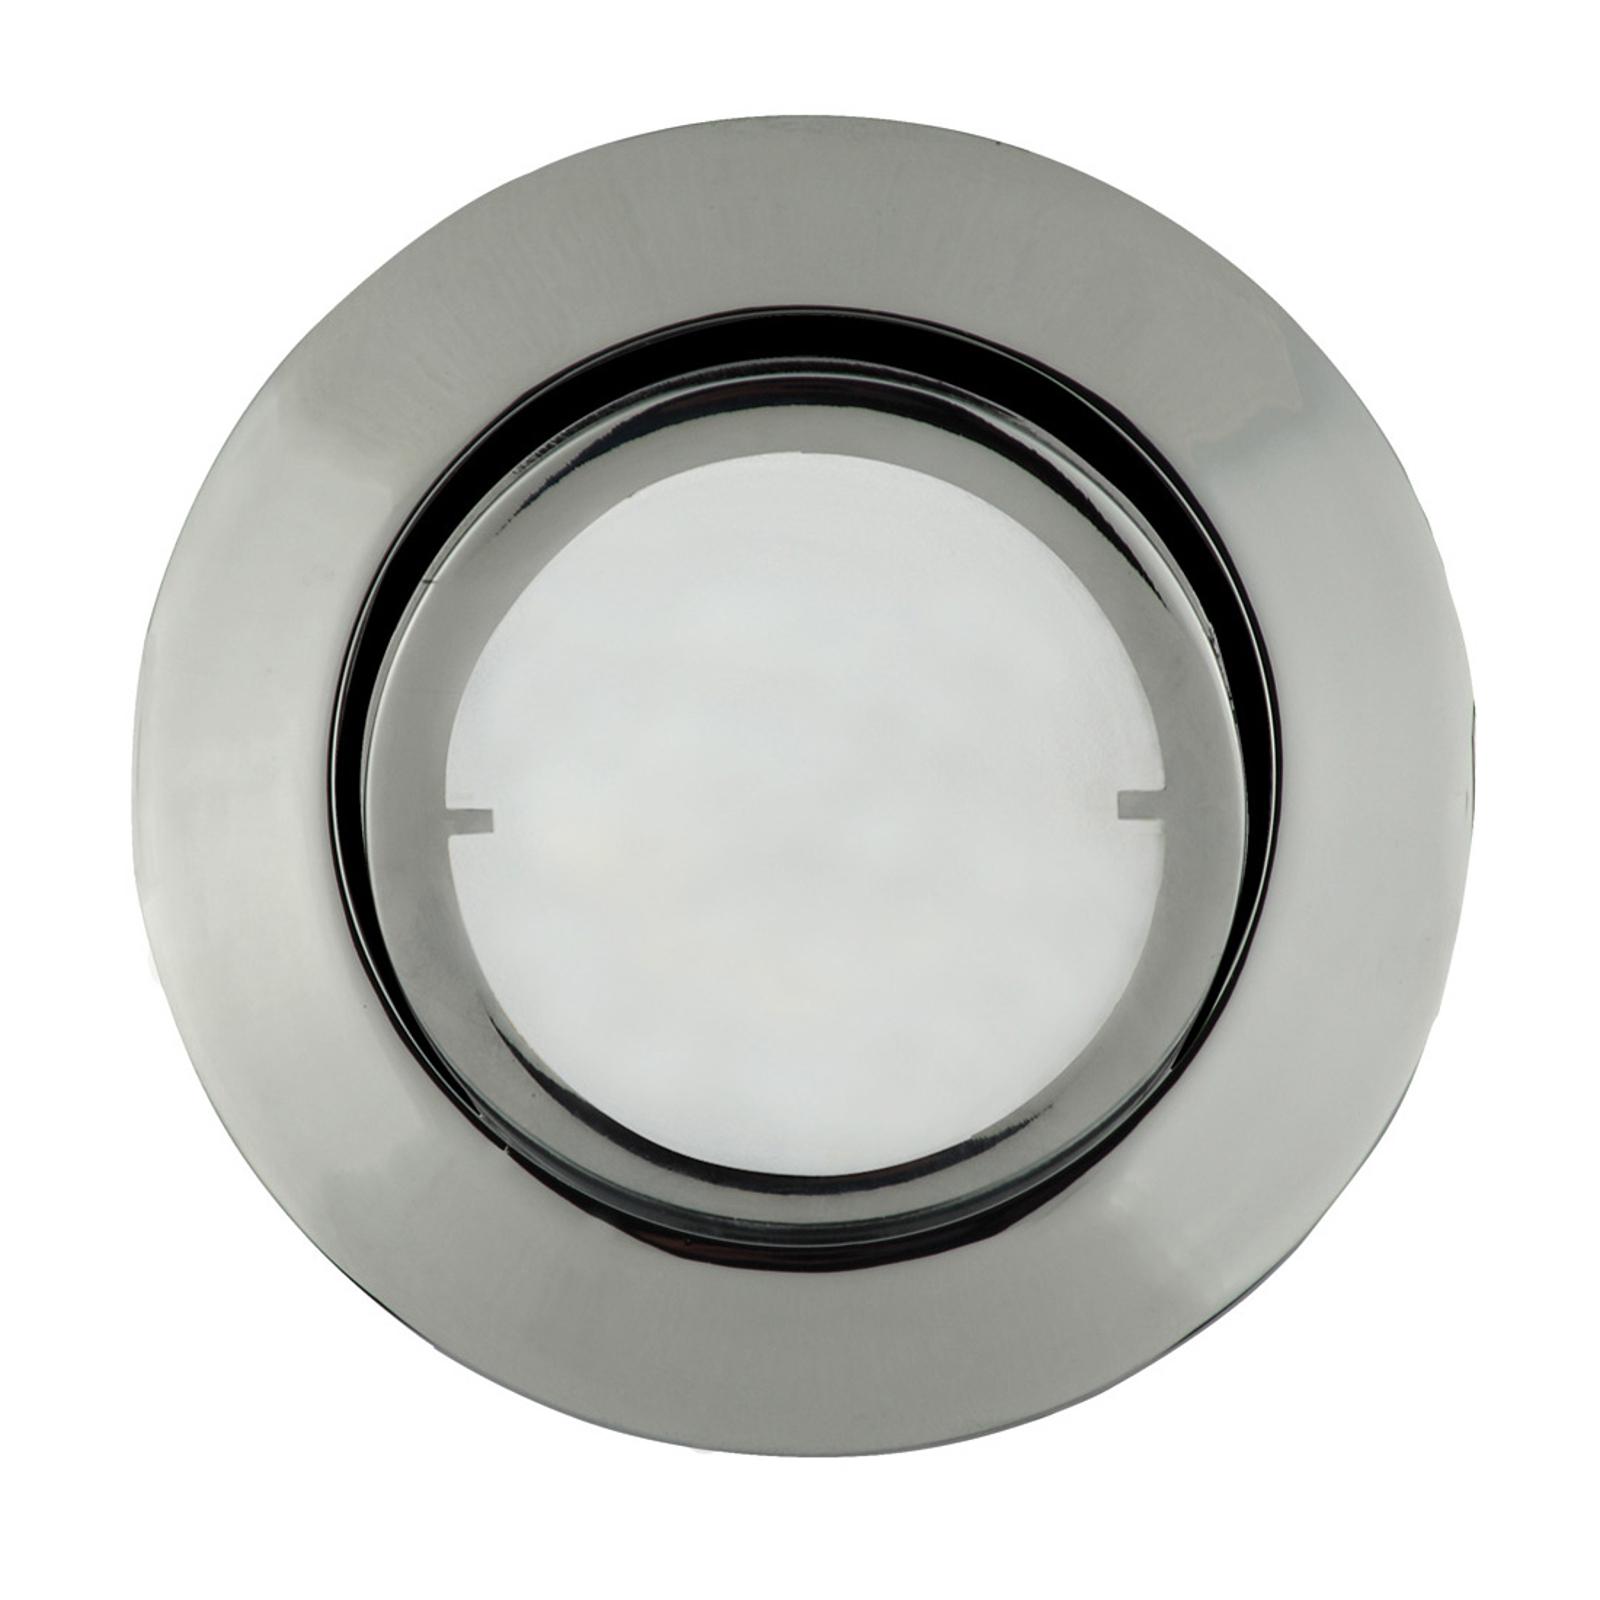 Round LED recessed light Joanie, chrome_1524124_1